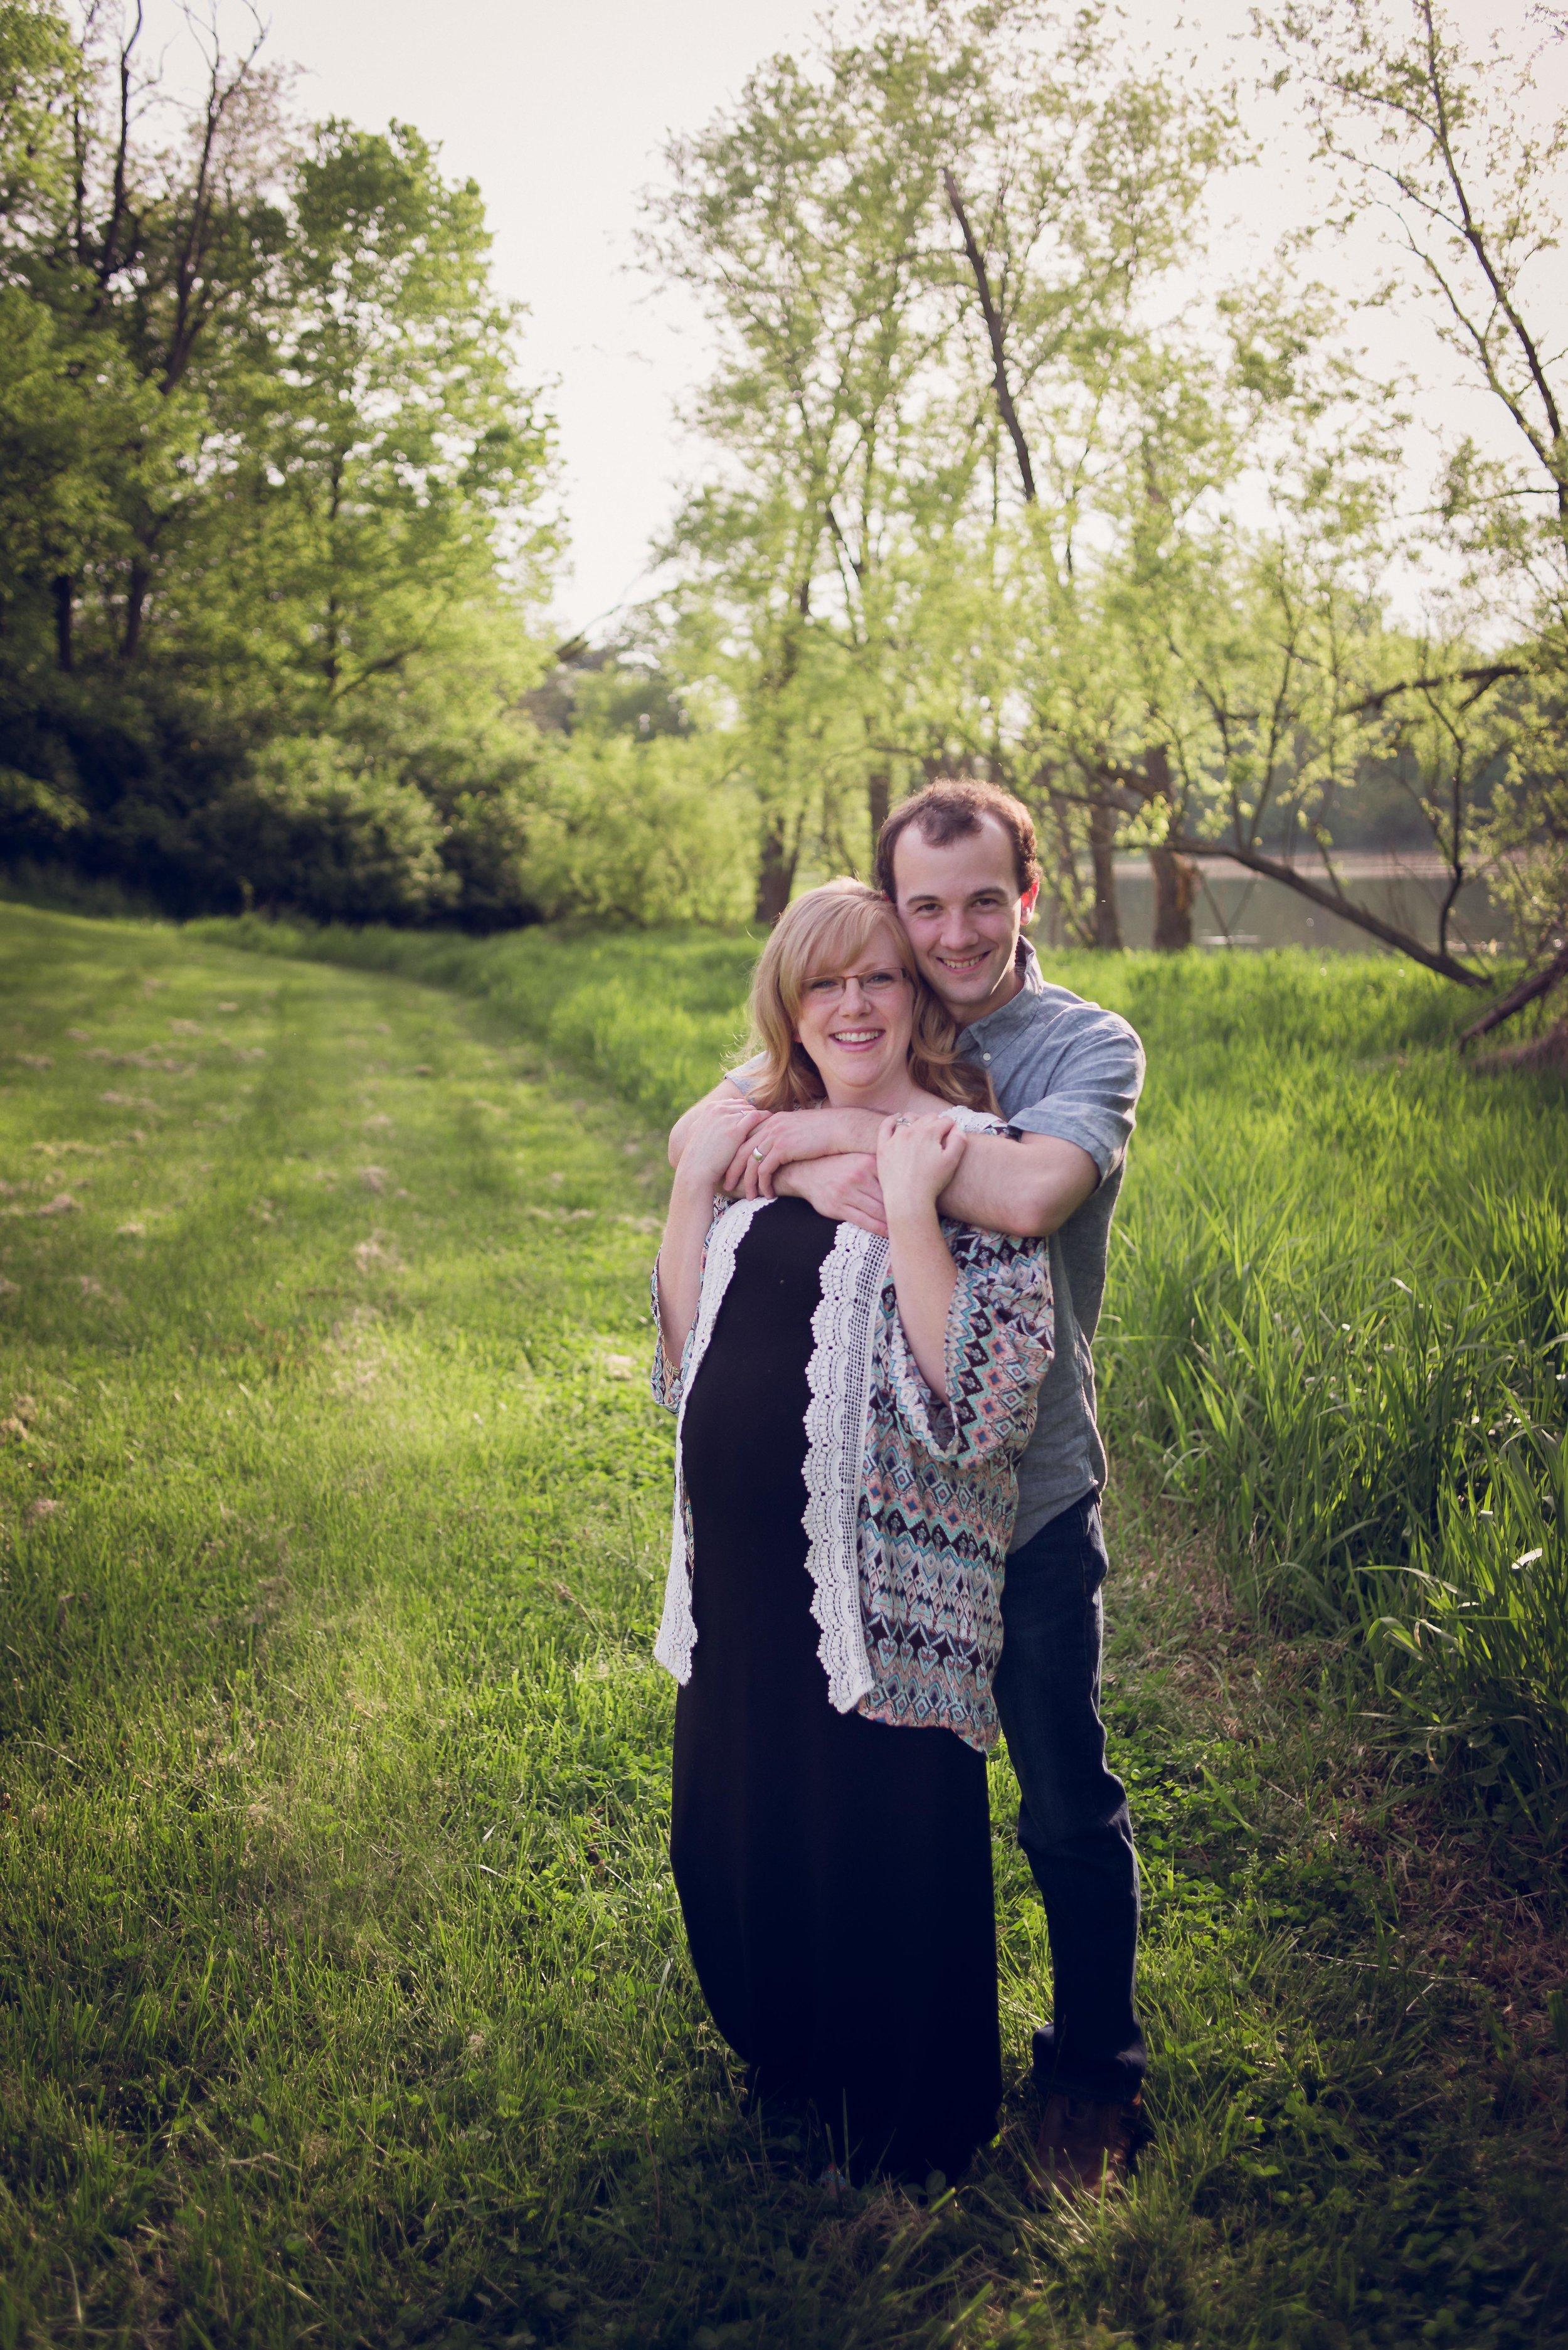 BrittneyHogue-MaternityPregnancyPhotographer-PeoriaIL-PekinIL-BloomingtonIL-5776.jpg